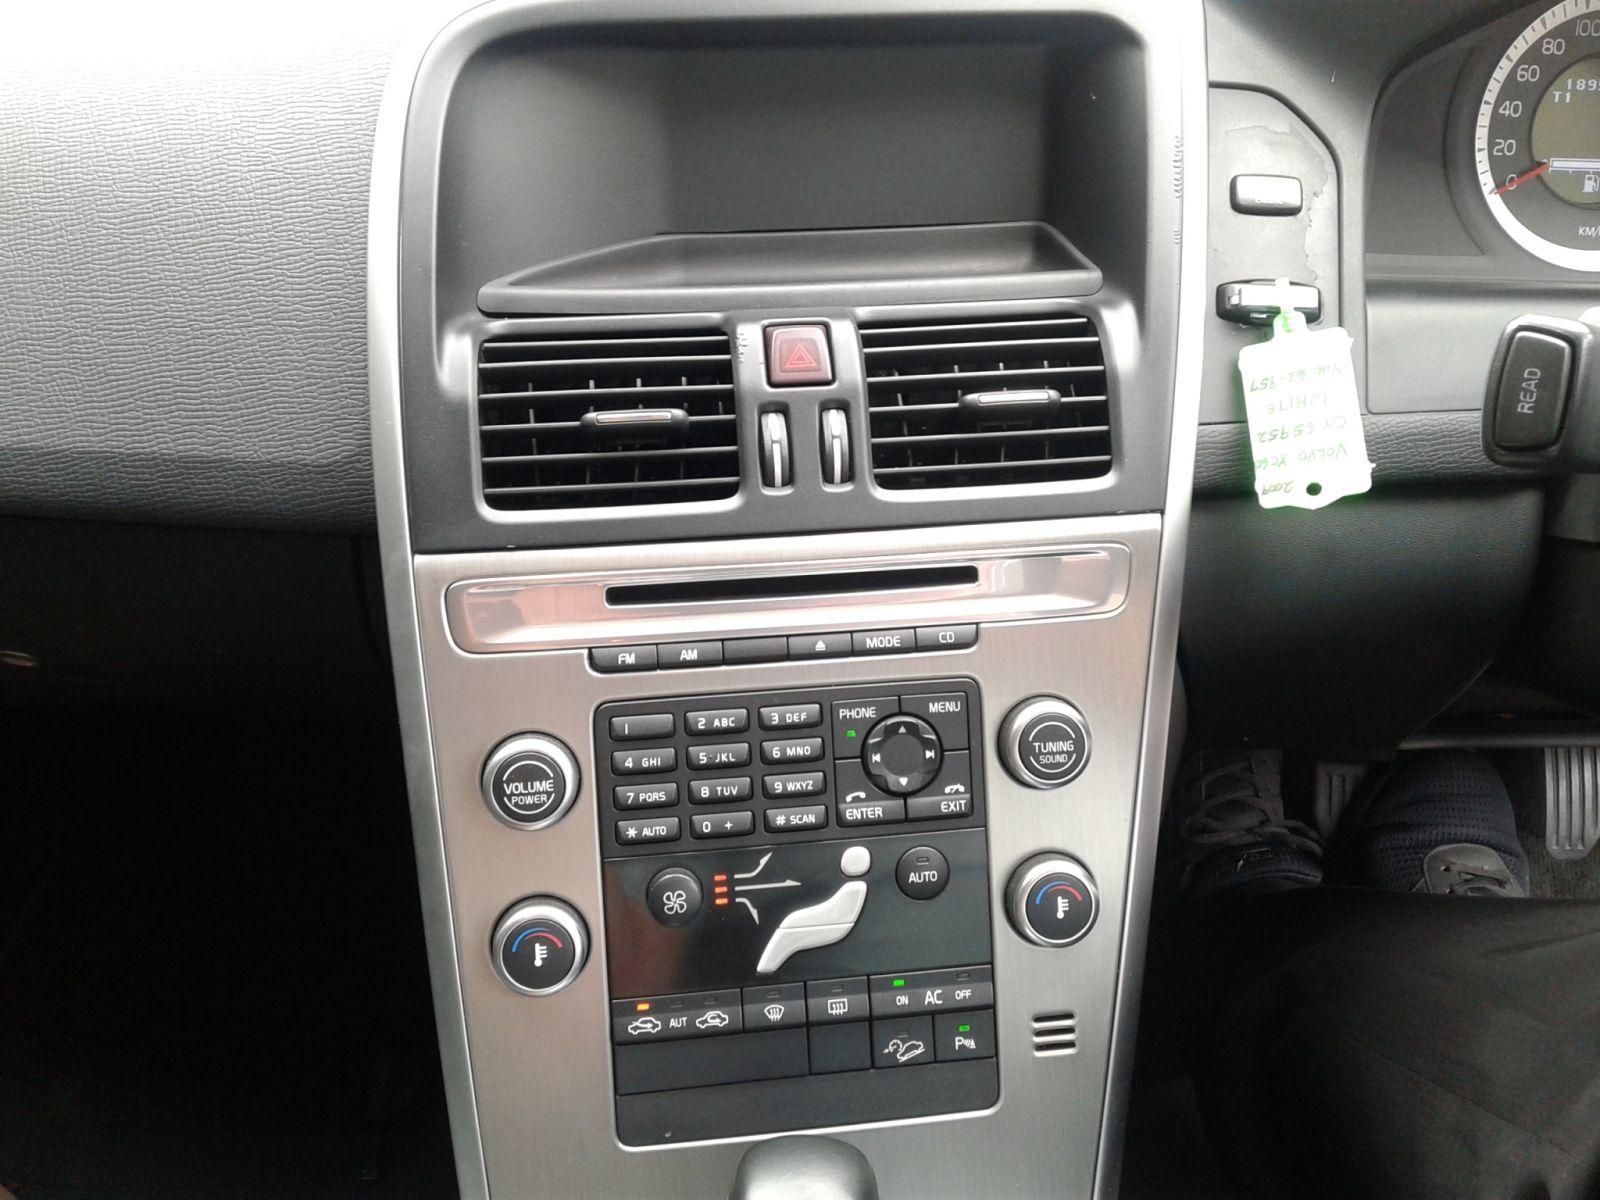 2009 VOLVO XC60 XC60 3.0T GEARTRONIC